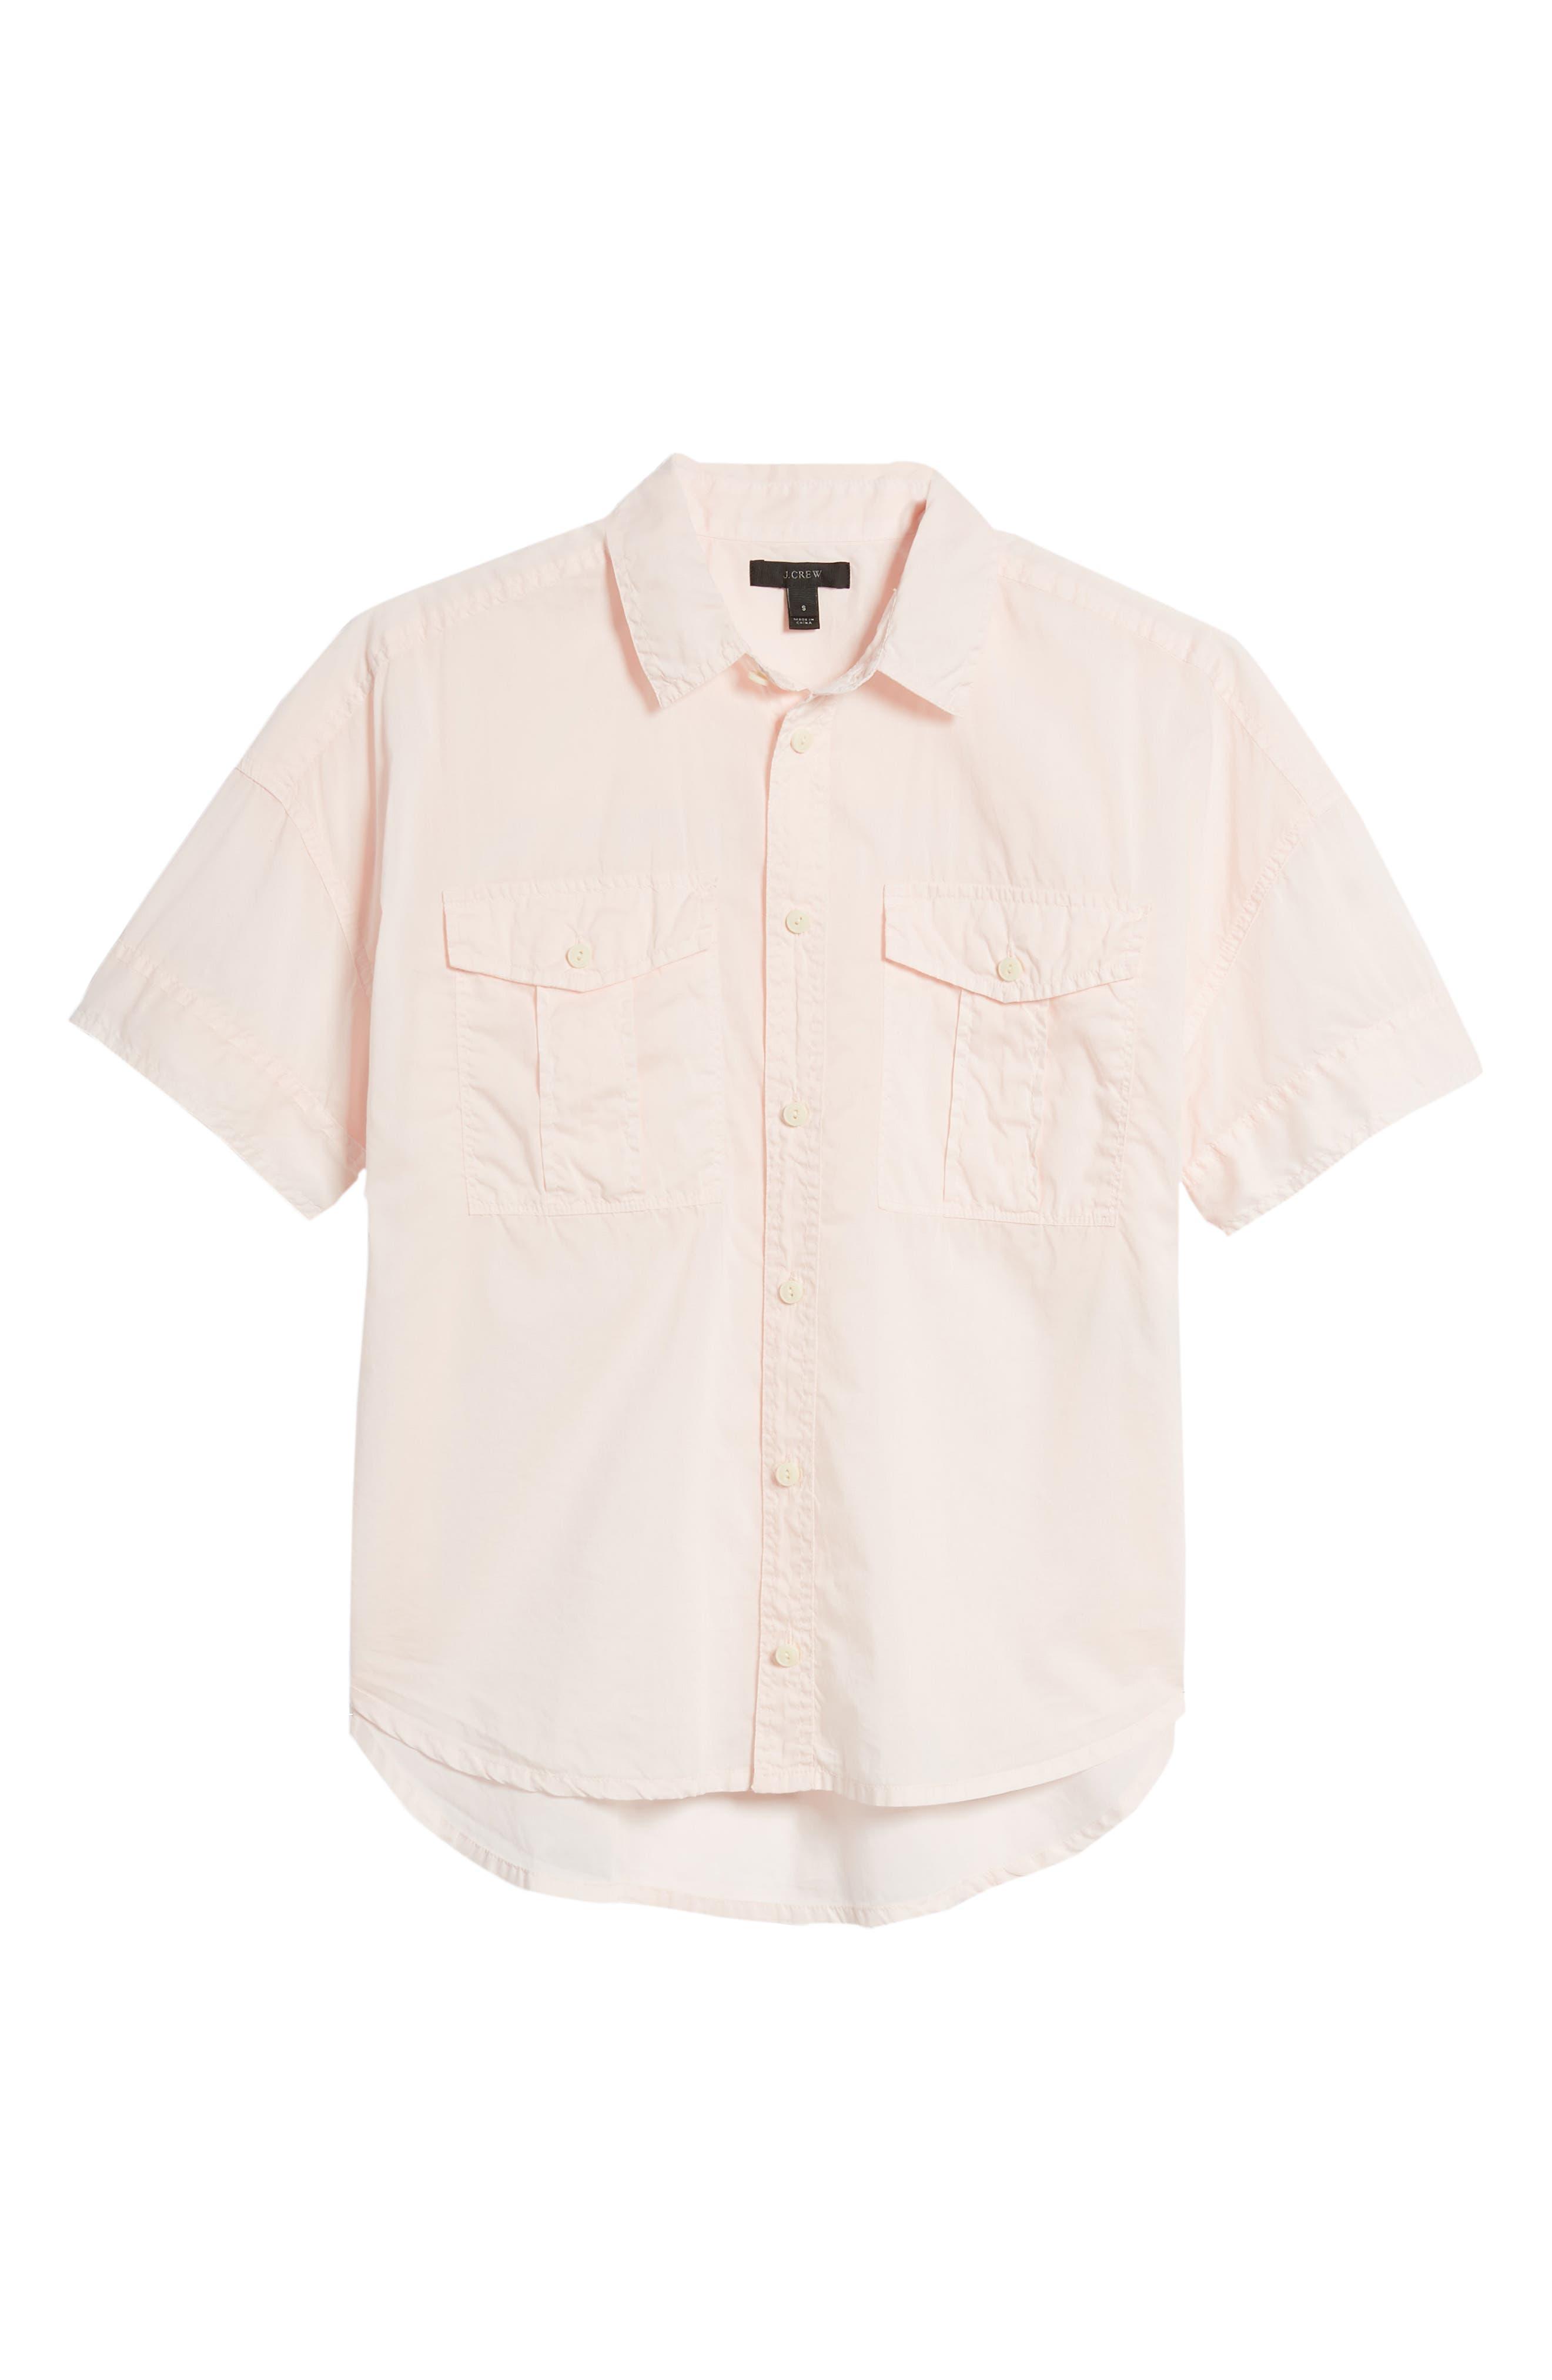 J.Crew Utility Pocket Shirt,                             Alternate thumbnail 9, color,                             Pastel Pink